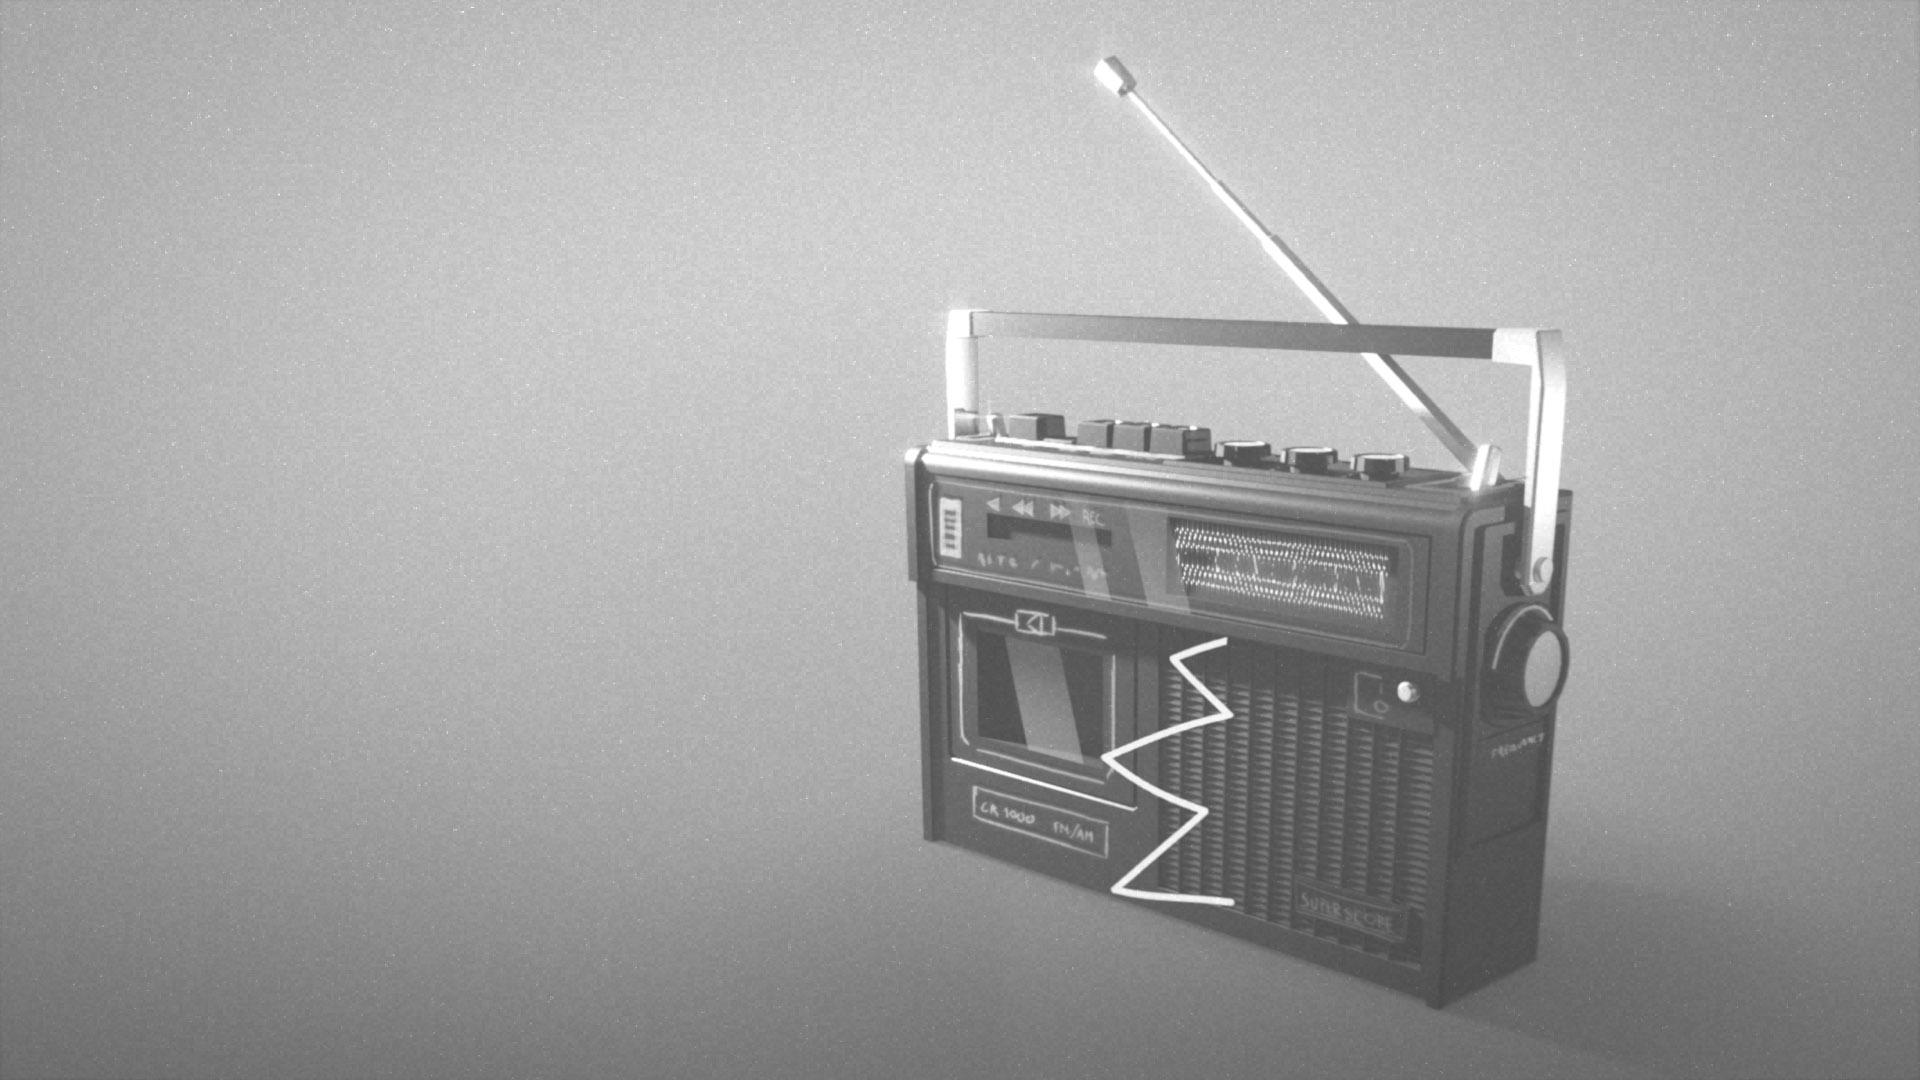 vj.04 radio banner black and white